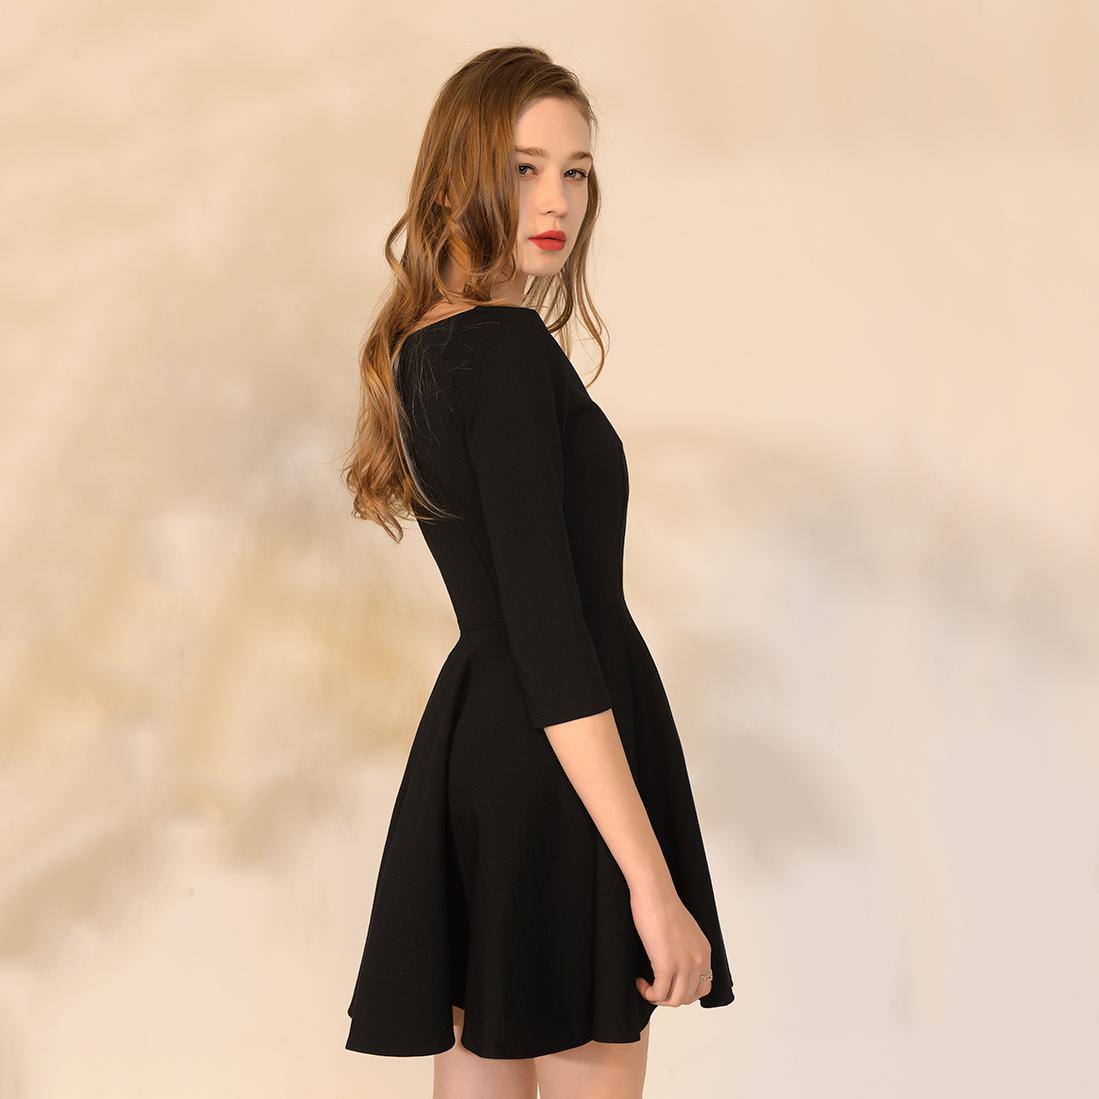 2018 New Design Summer Female O-neck Sleeveless Elegant black Lace Dress